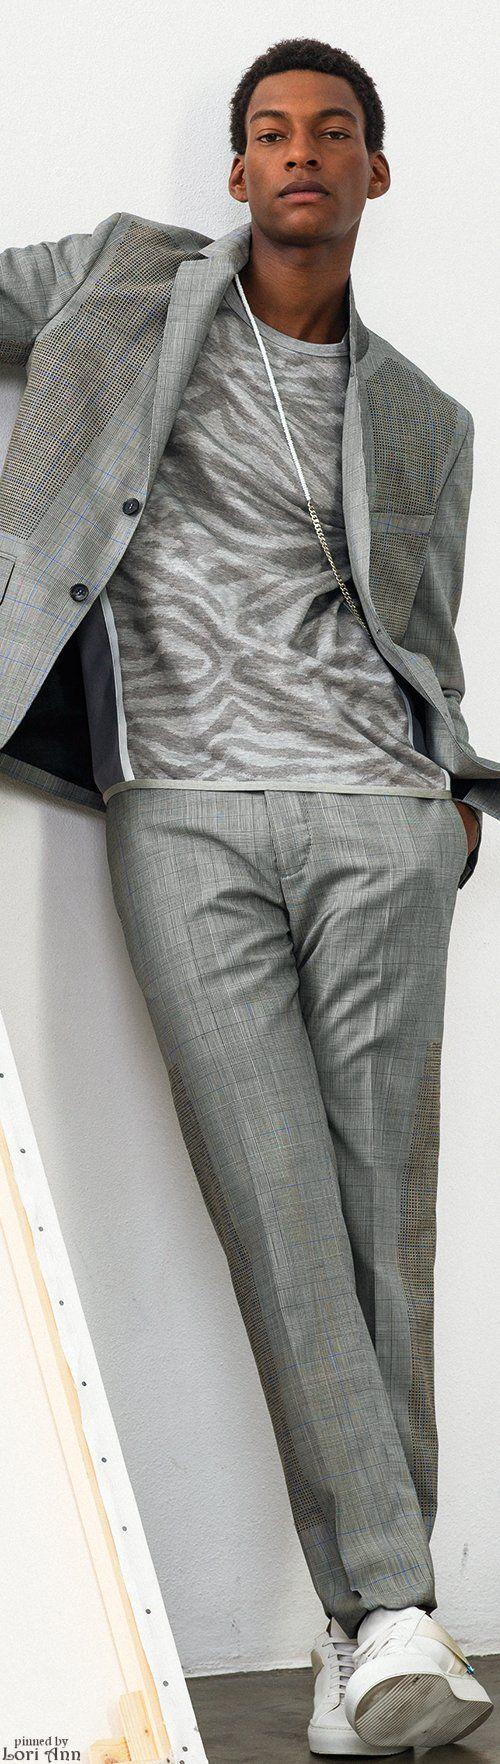 25 Best X Images On Pinterest Men Fashion Gentleman And Lgs Slim Fit Ladies Shirt Blue White Plaid Biru Muda M Oamc Spring 2016 Mens Menswear Gray Suit T